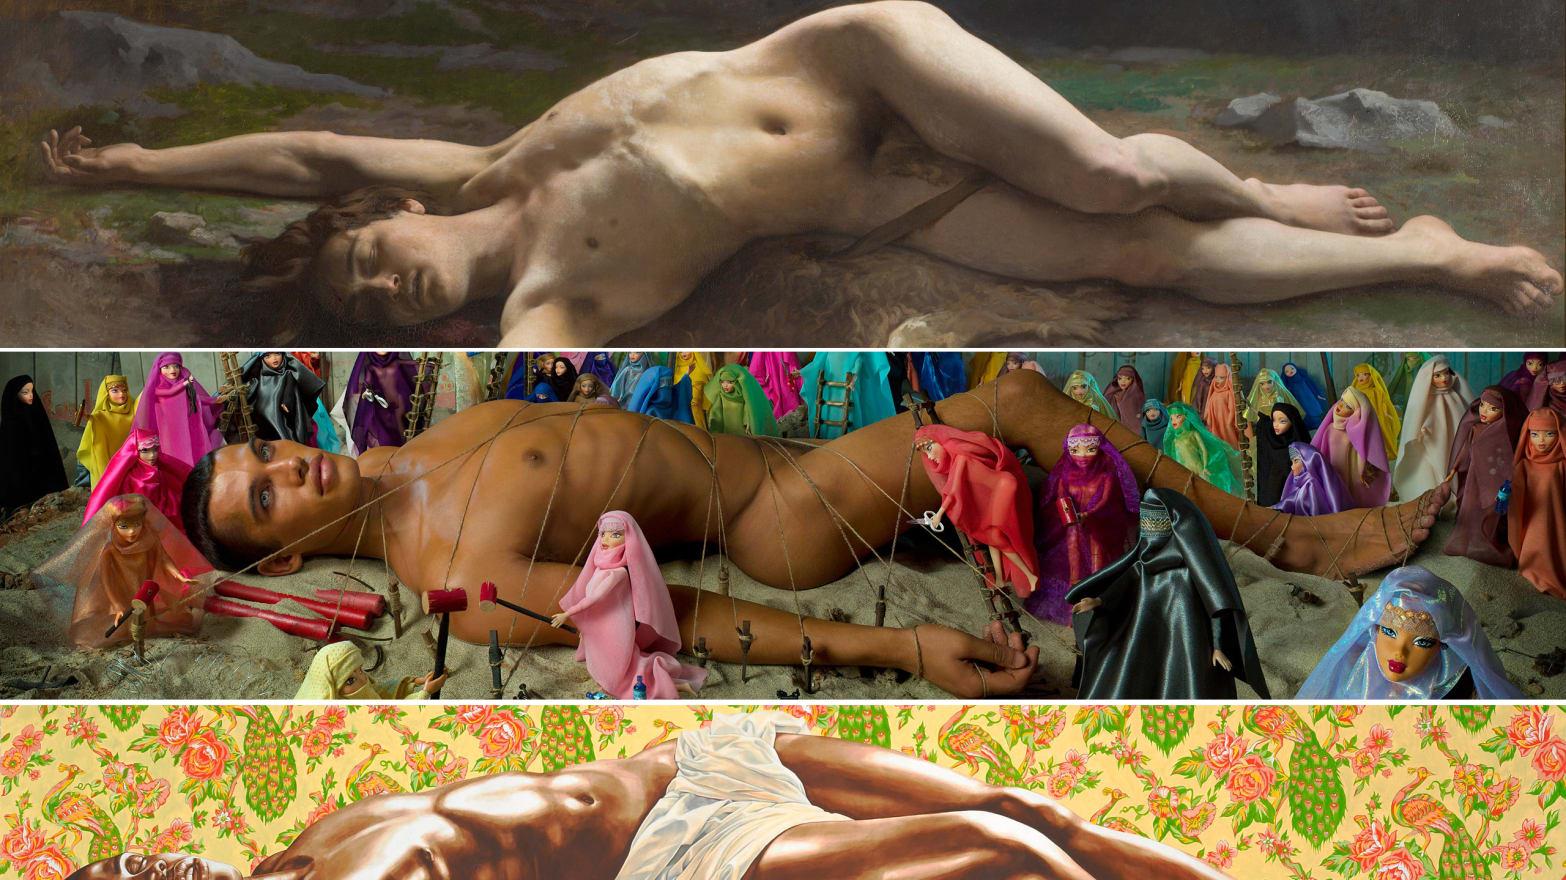 'Masculin, Masculin,' a Retrospective of Male Nudity in Art, Opens in Paris